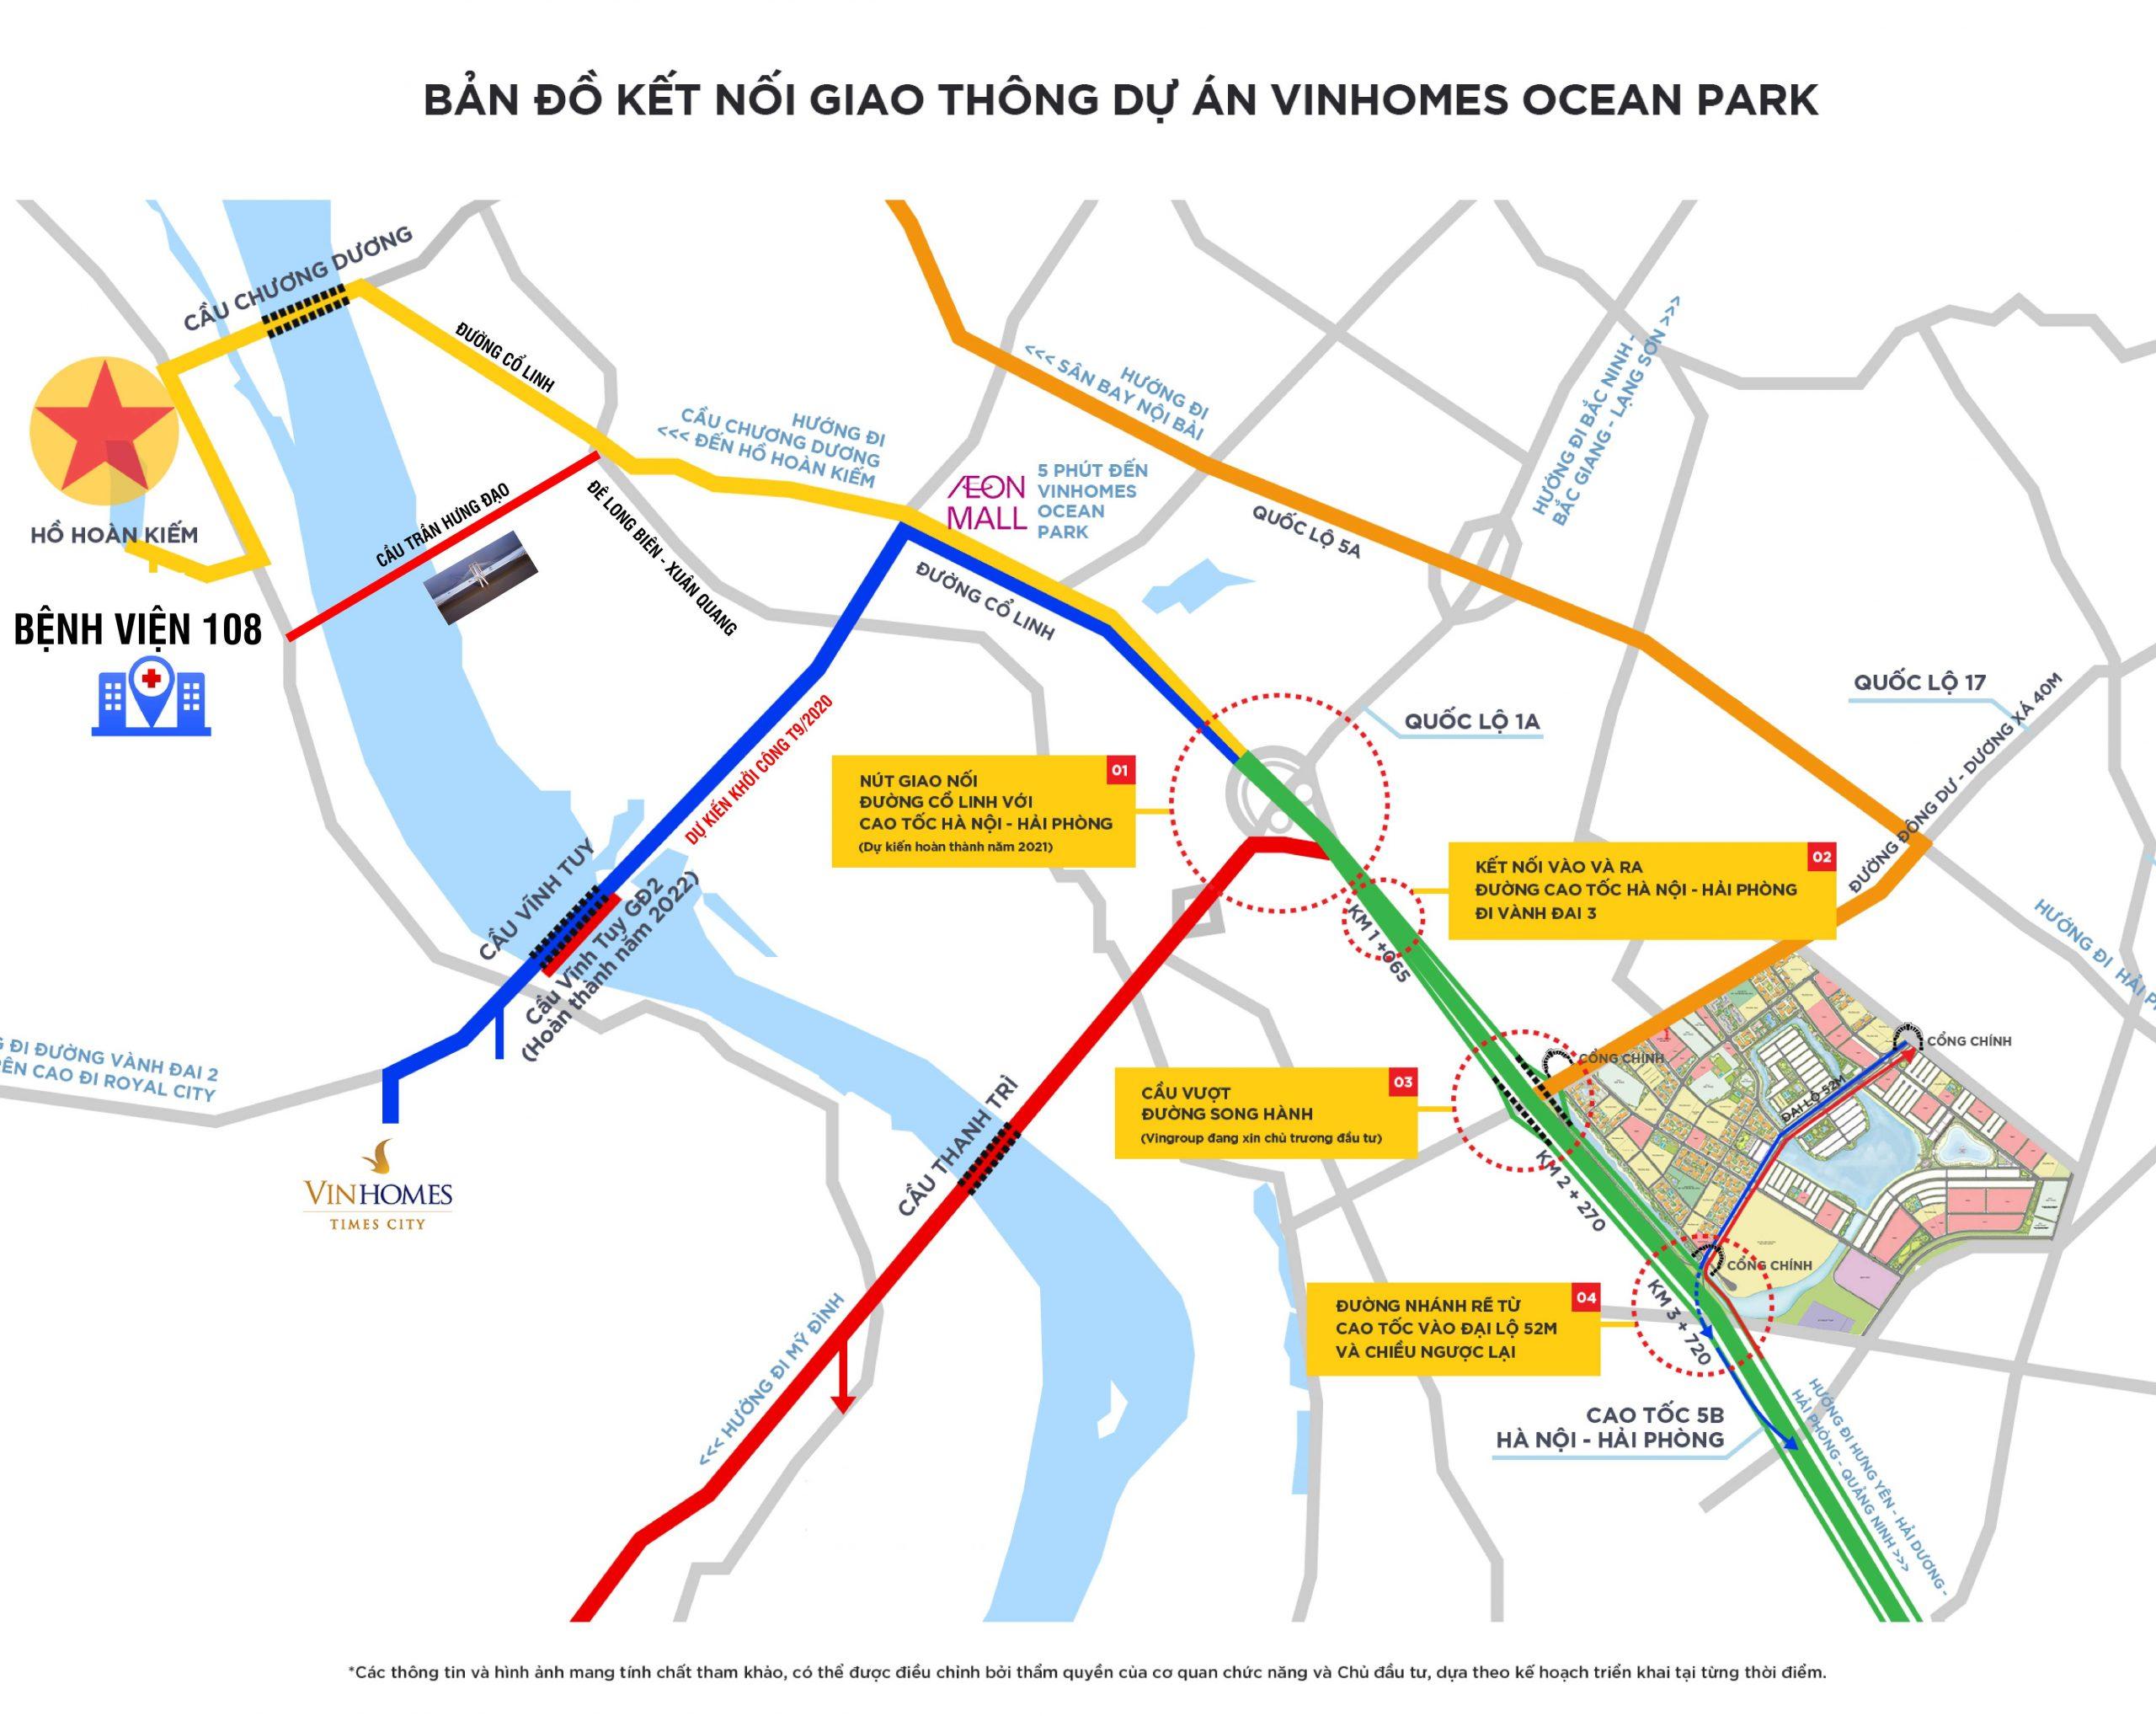 vị trí vinhomes ocean park